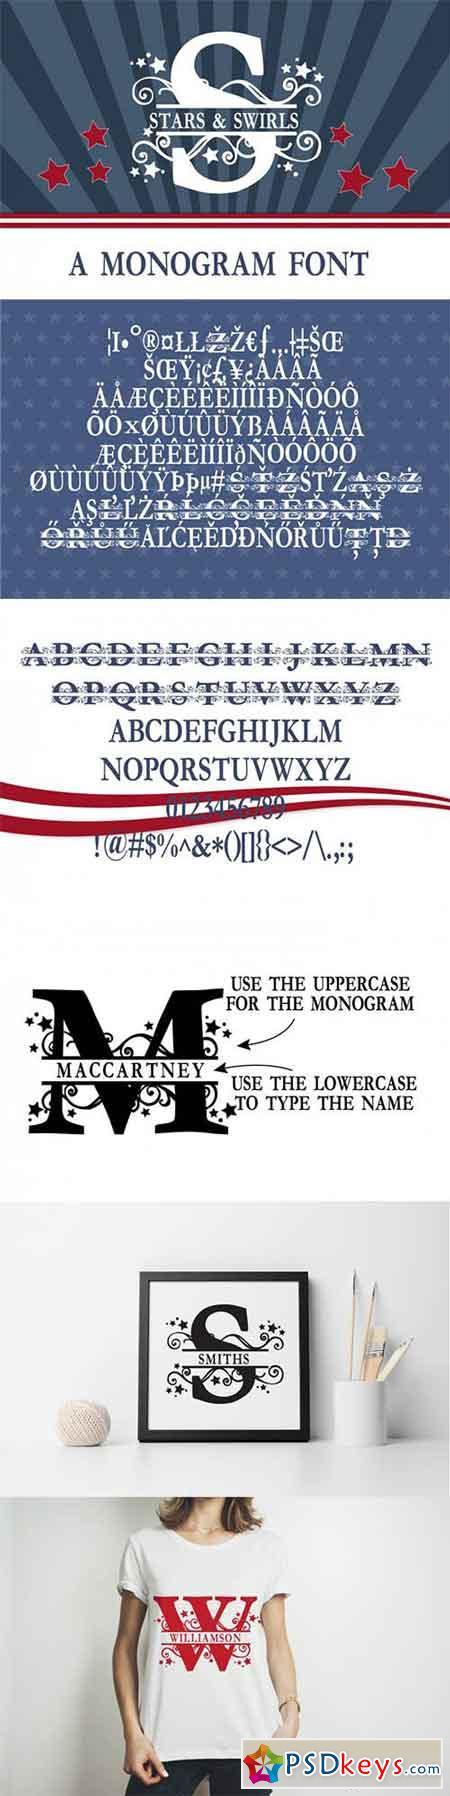 PN Stars & Swirls Monogram Banner Font 3463764